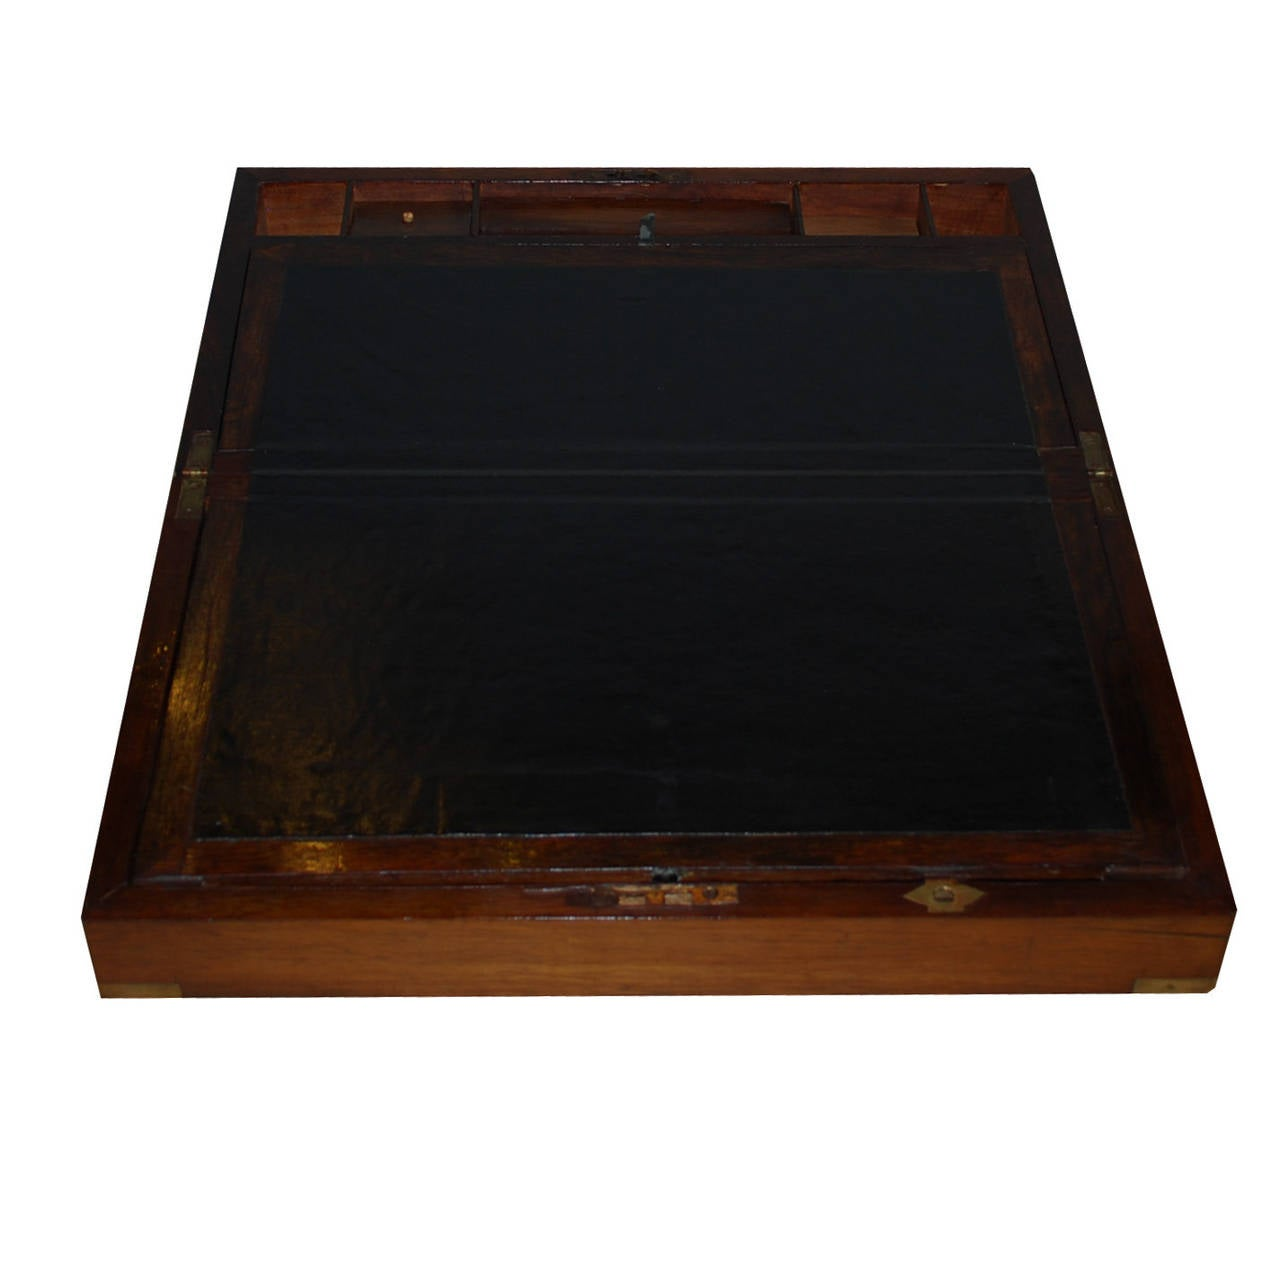 European 19th Century Mahogany Writing Box For Sale